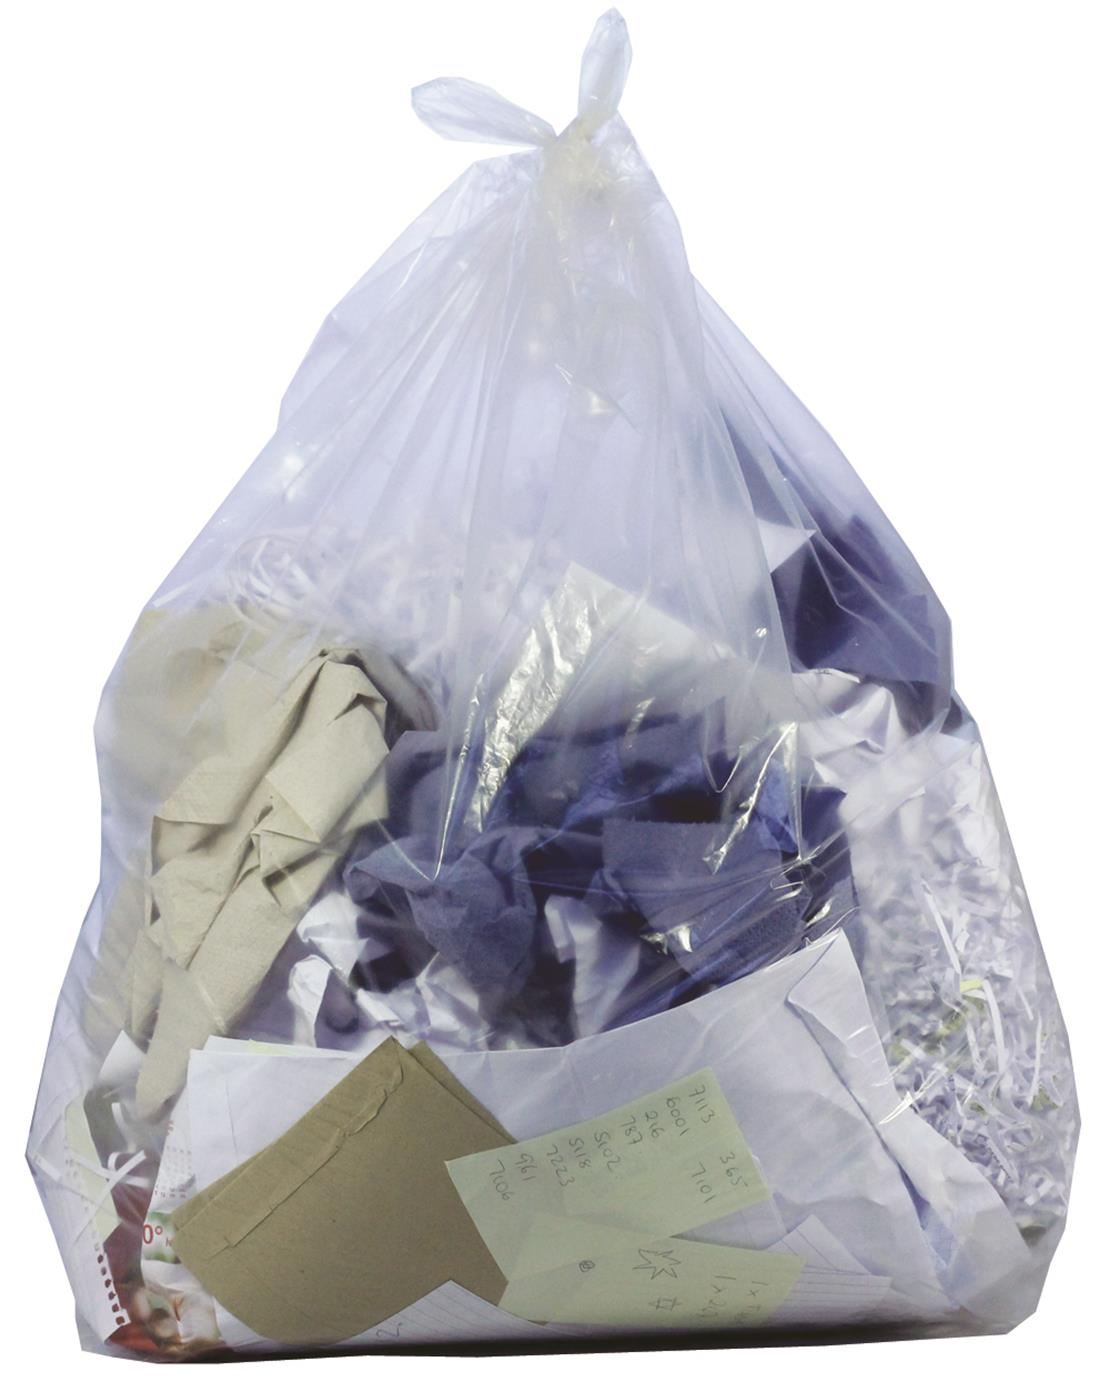 PUMA Clear Refuse sacks